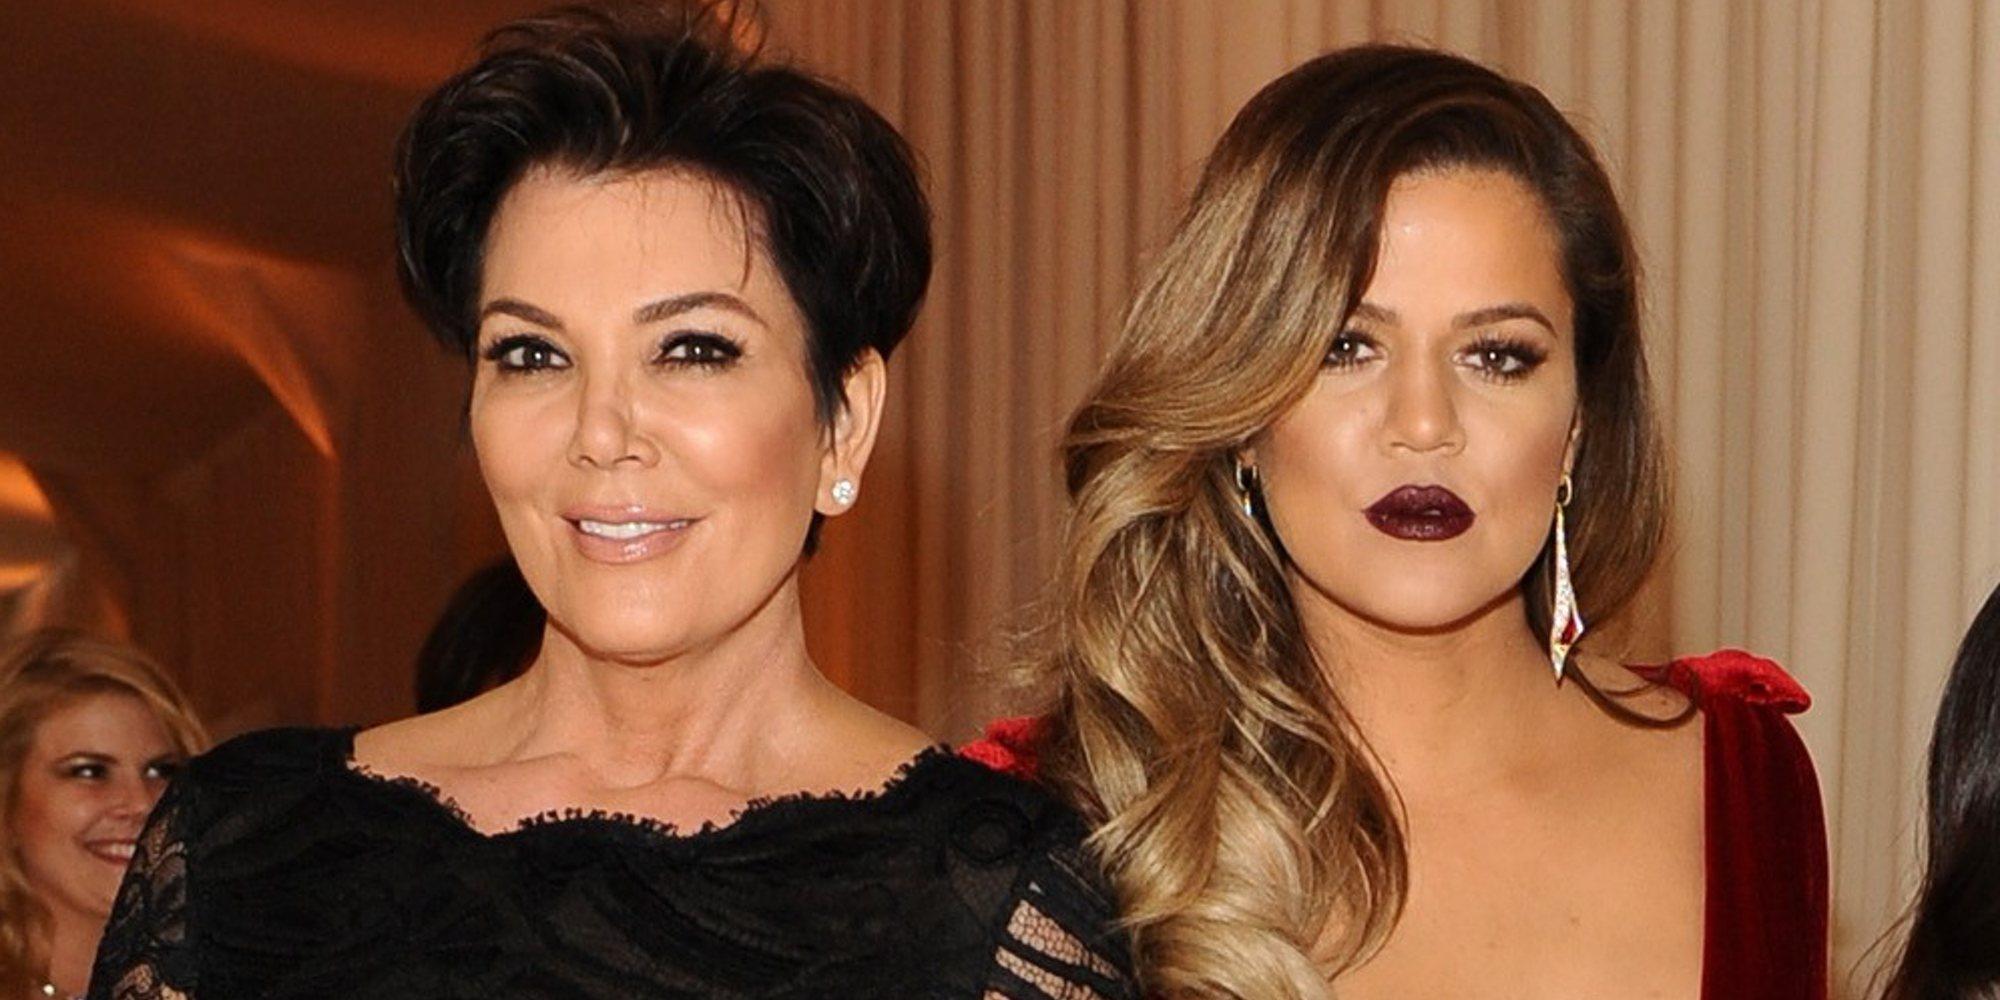 ¿Se han comprometido Khloé Kardashian y Tristan Thompson? Kris Jenner no se atreve a responder